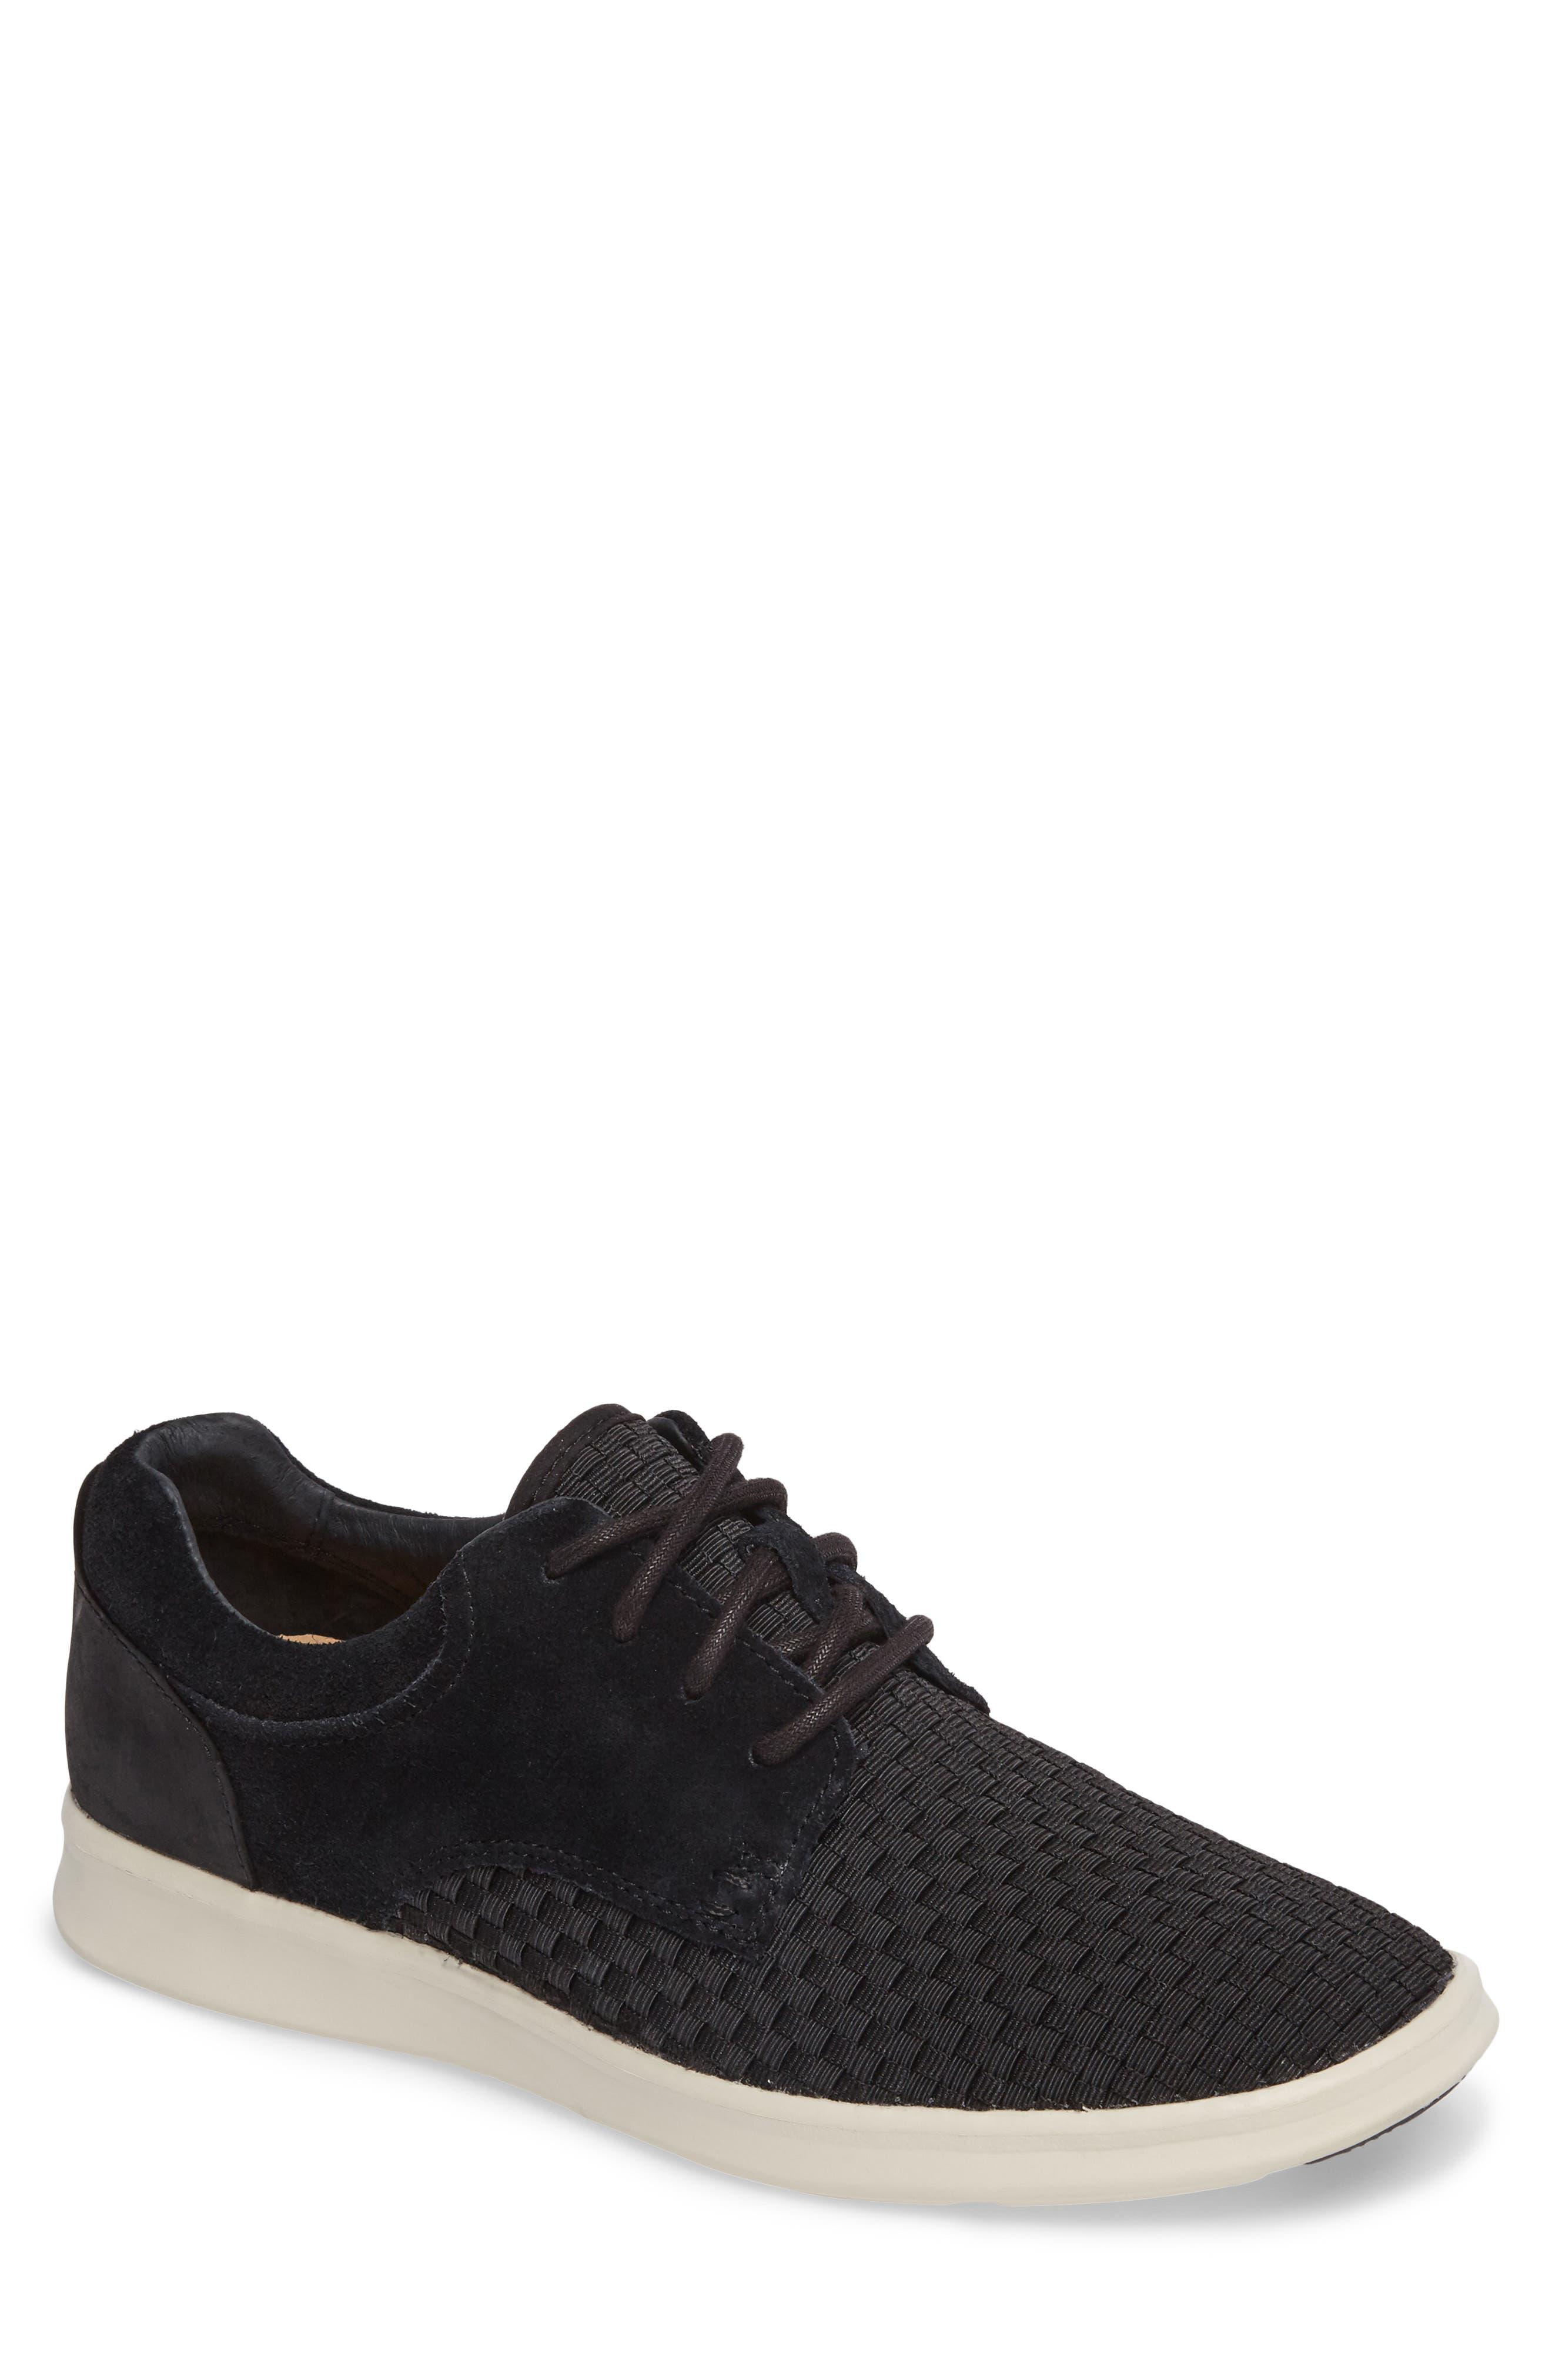 'Hepner' Woven Sneaker,                         Main,                         color, Blk